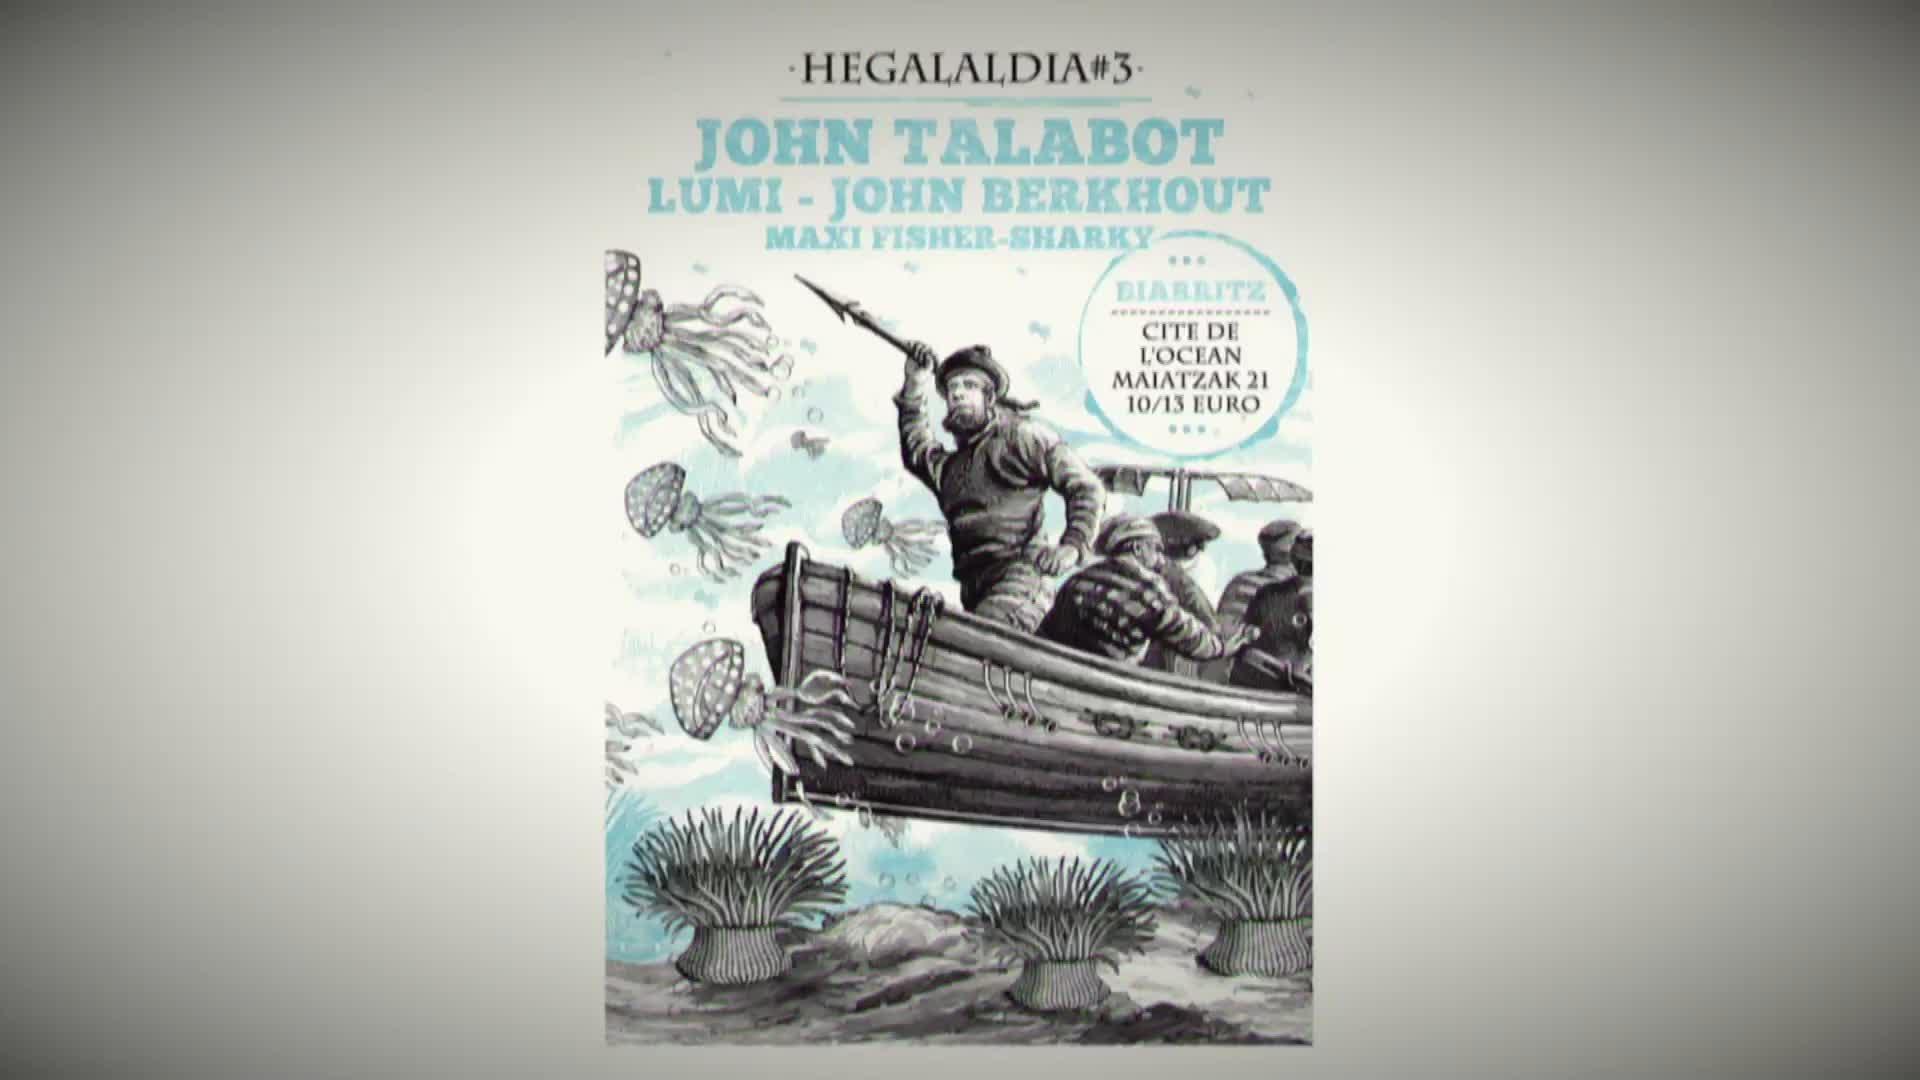 Hegalaldia #3: John Talabot - John Berkhout - Lumi / Biarritz